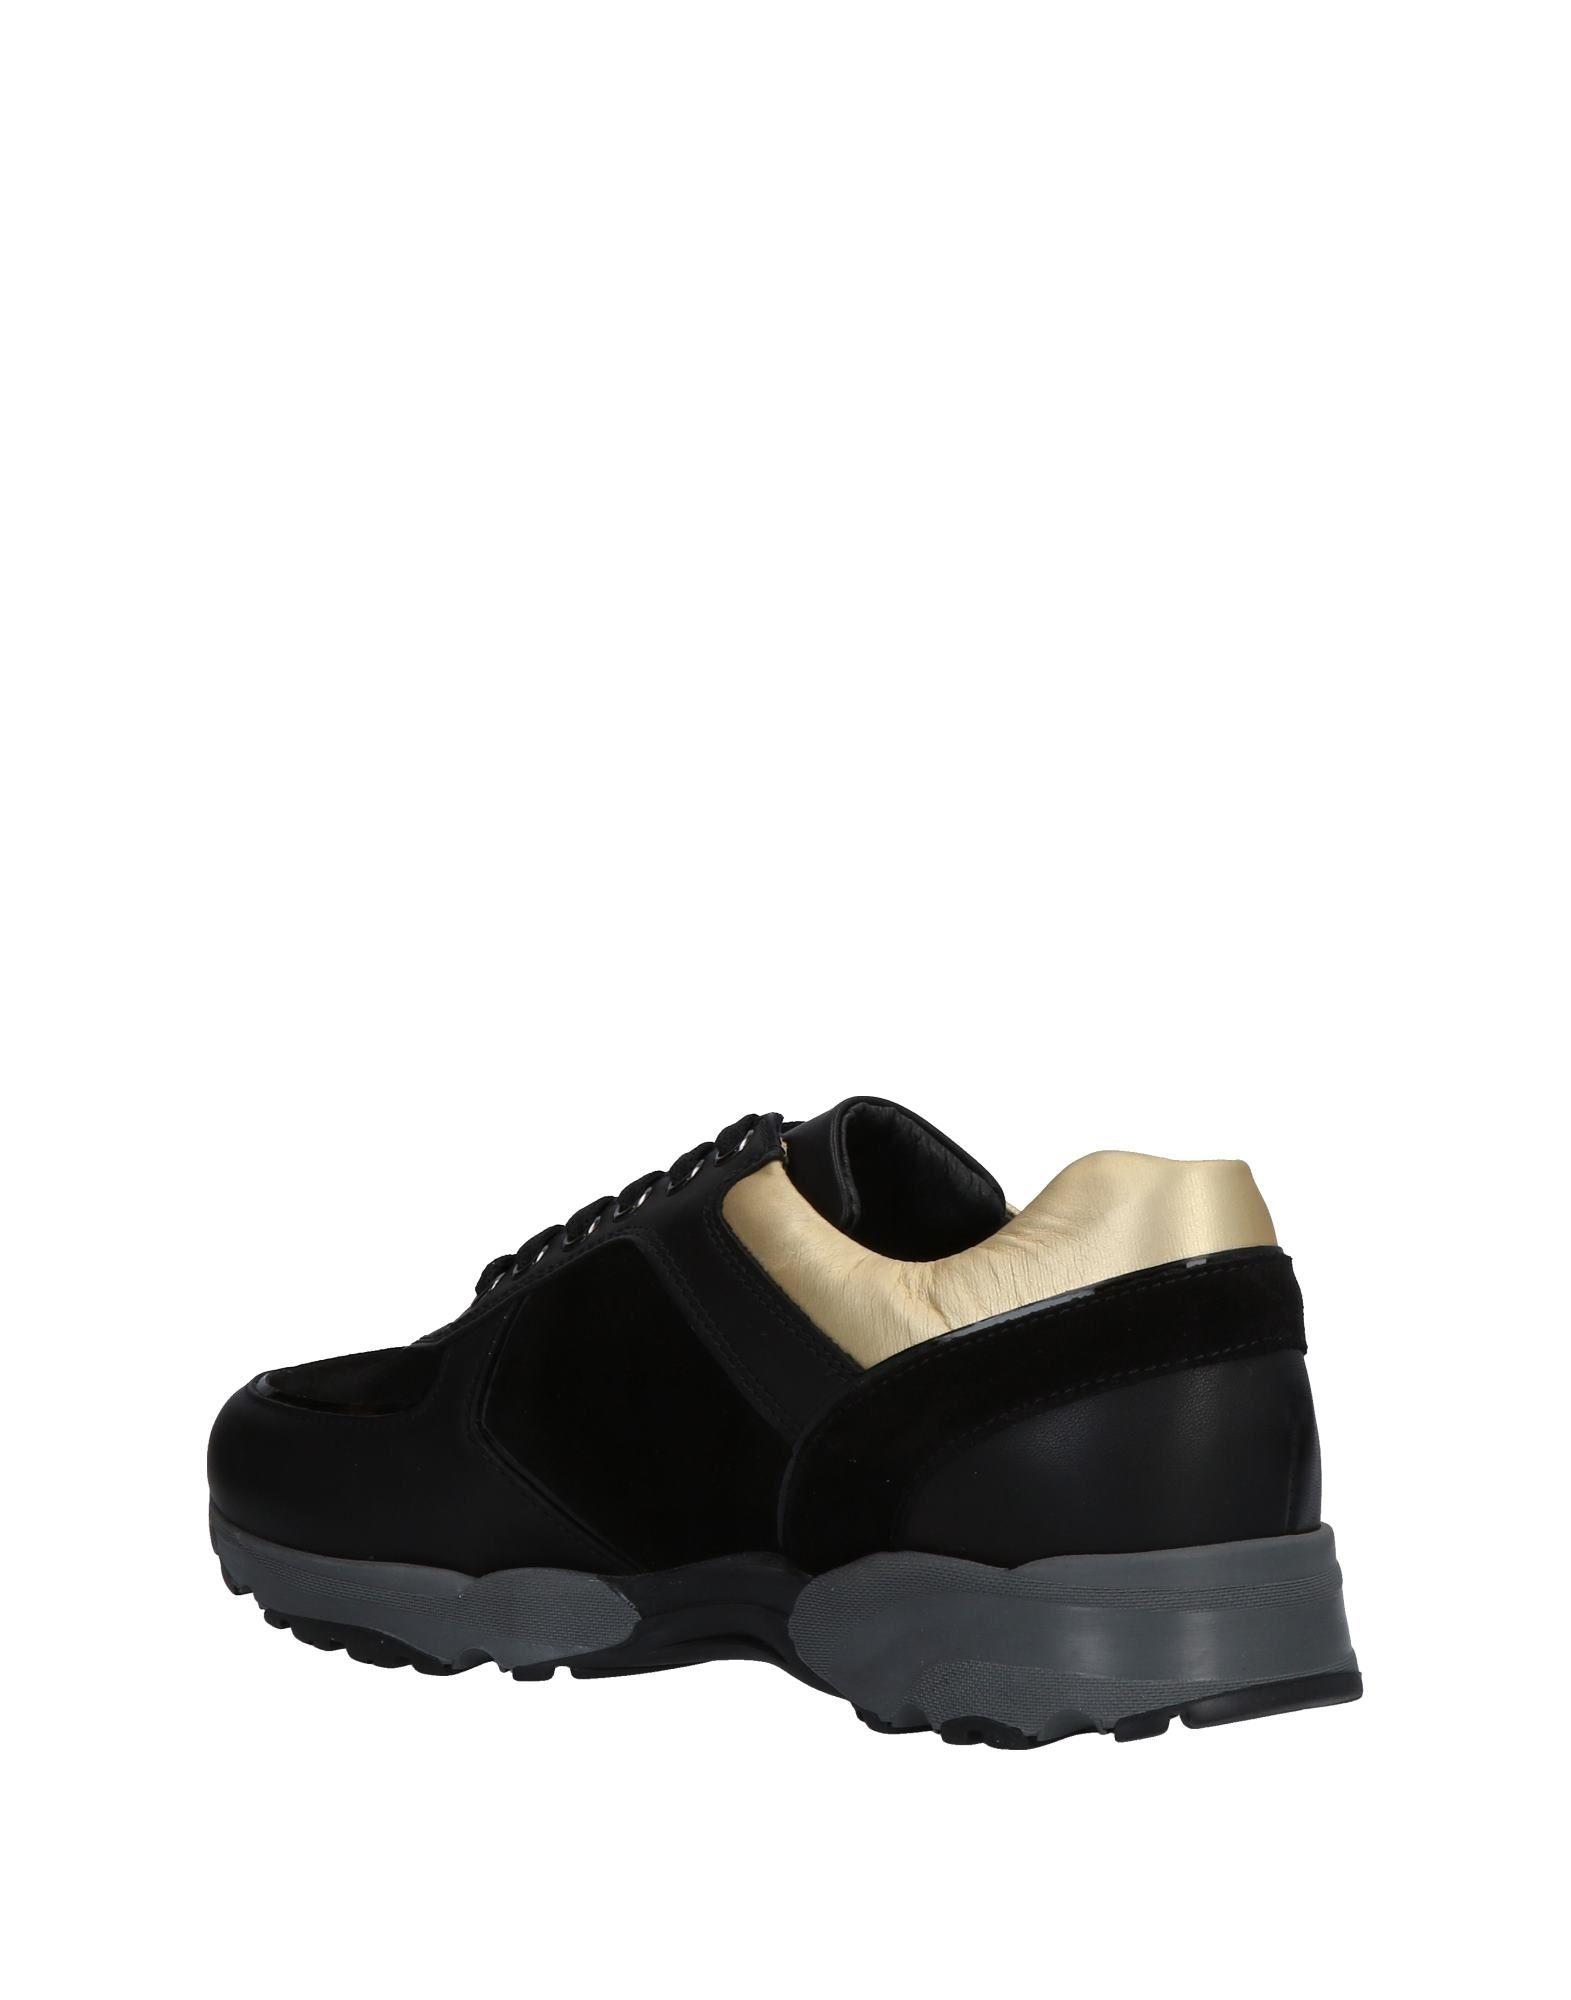 Samsonite Gute Sneakers Damen  11469650NM Gute Samsonite Qualität beliebte Schuhe 41b431